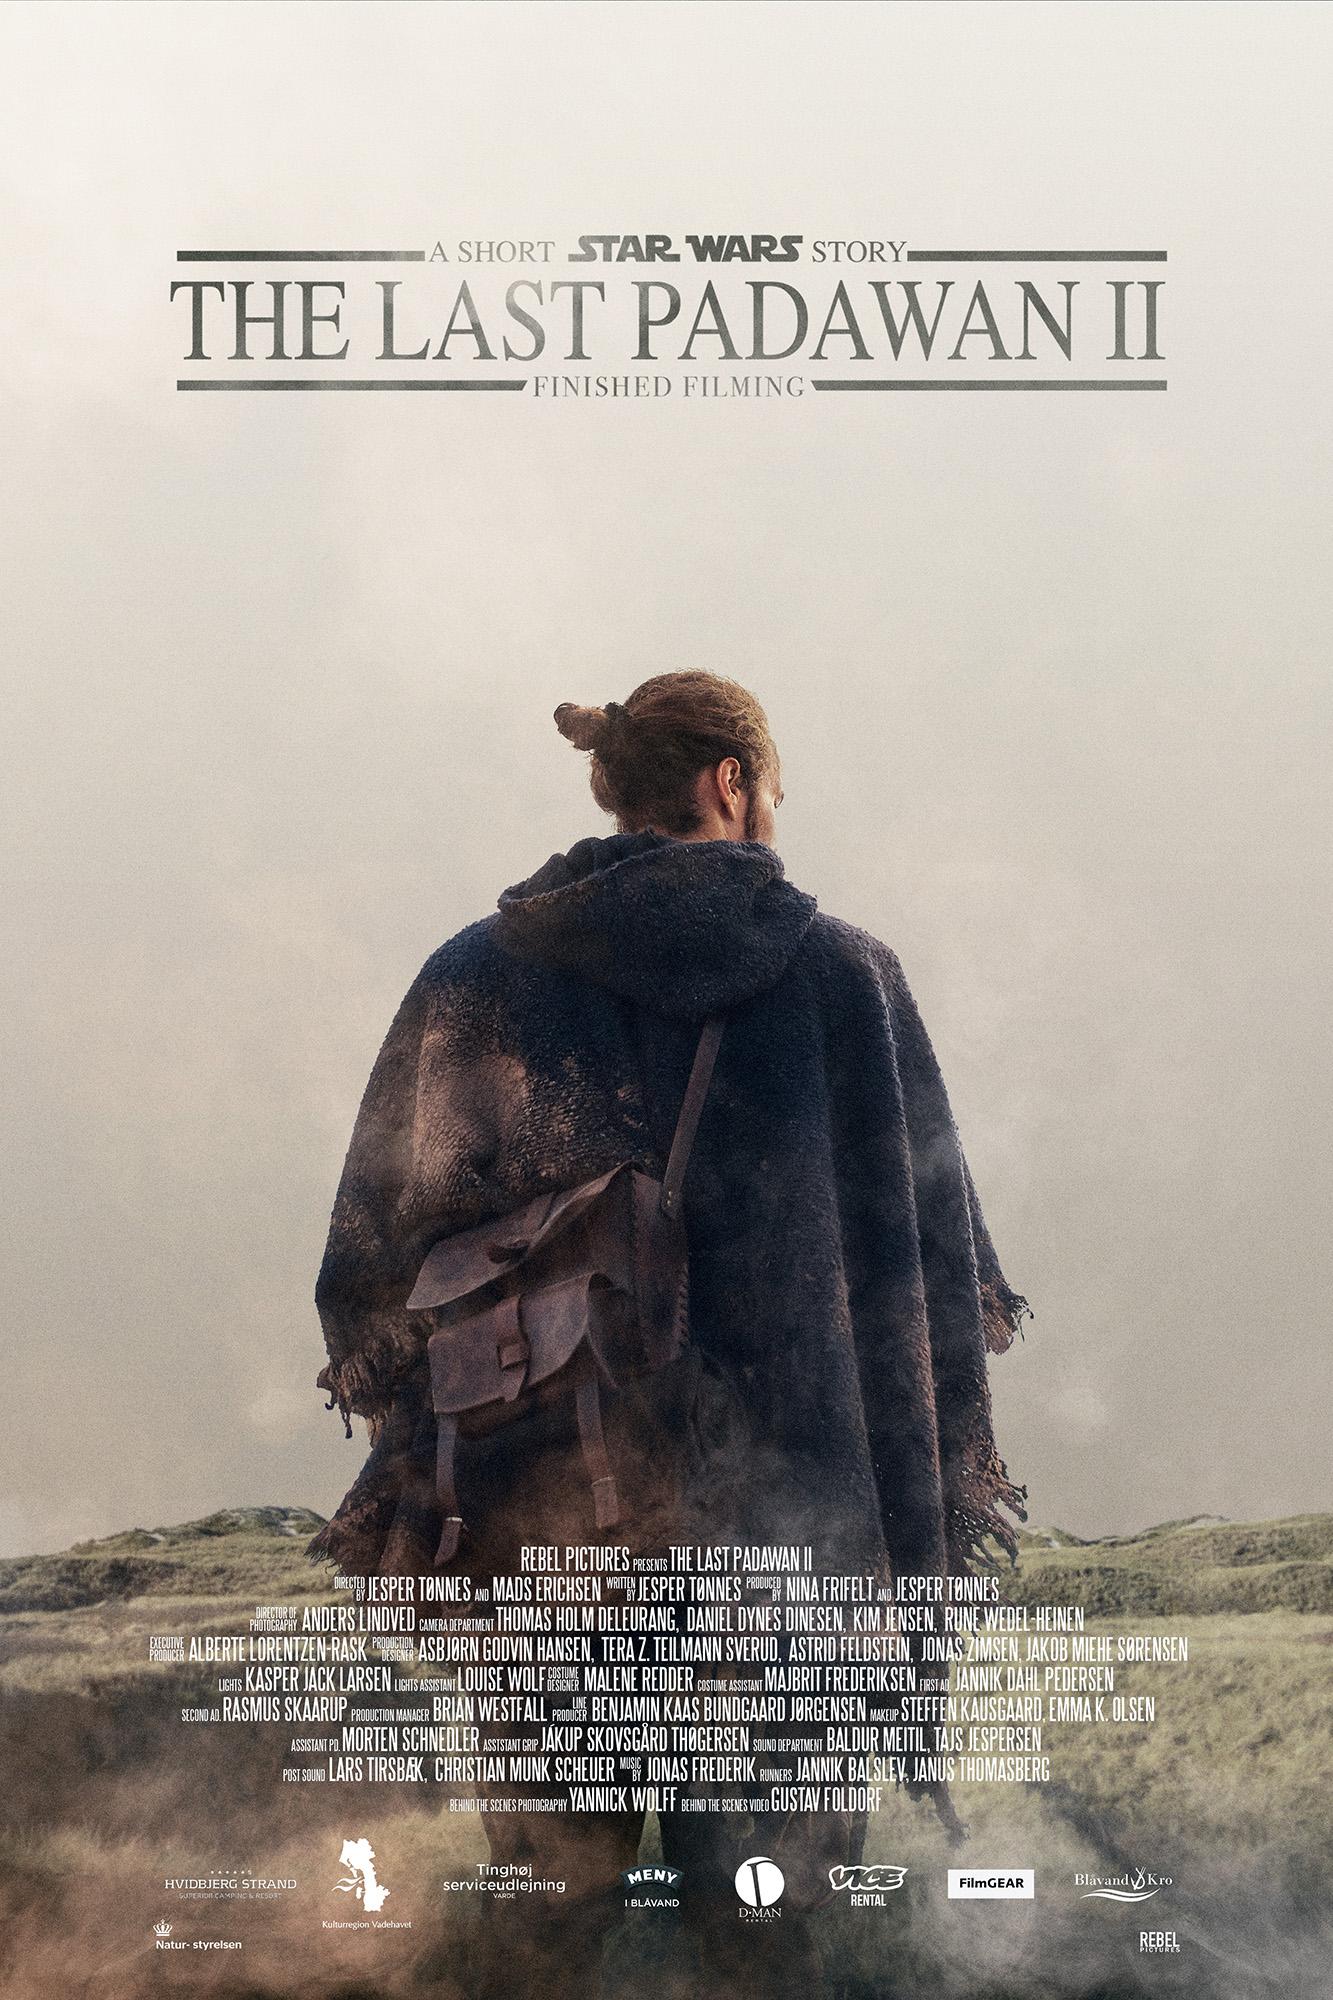 Movie Poster | THE LAST PADAWAN II